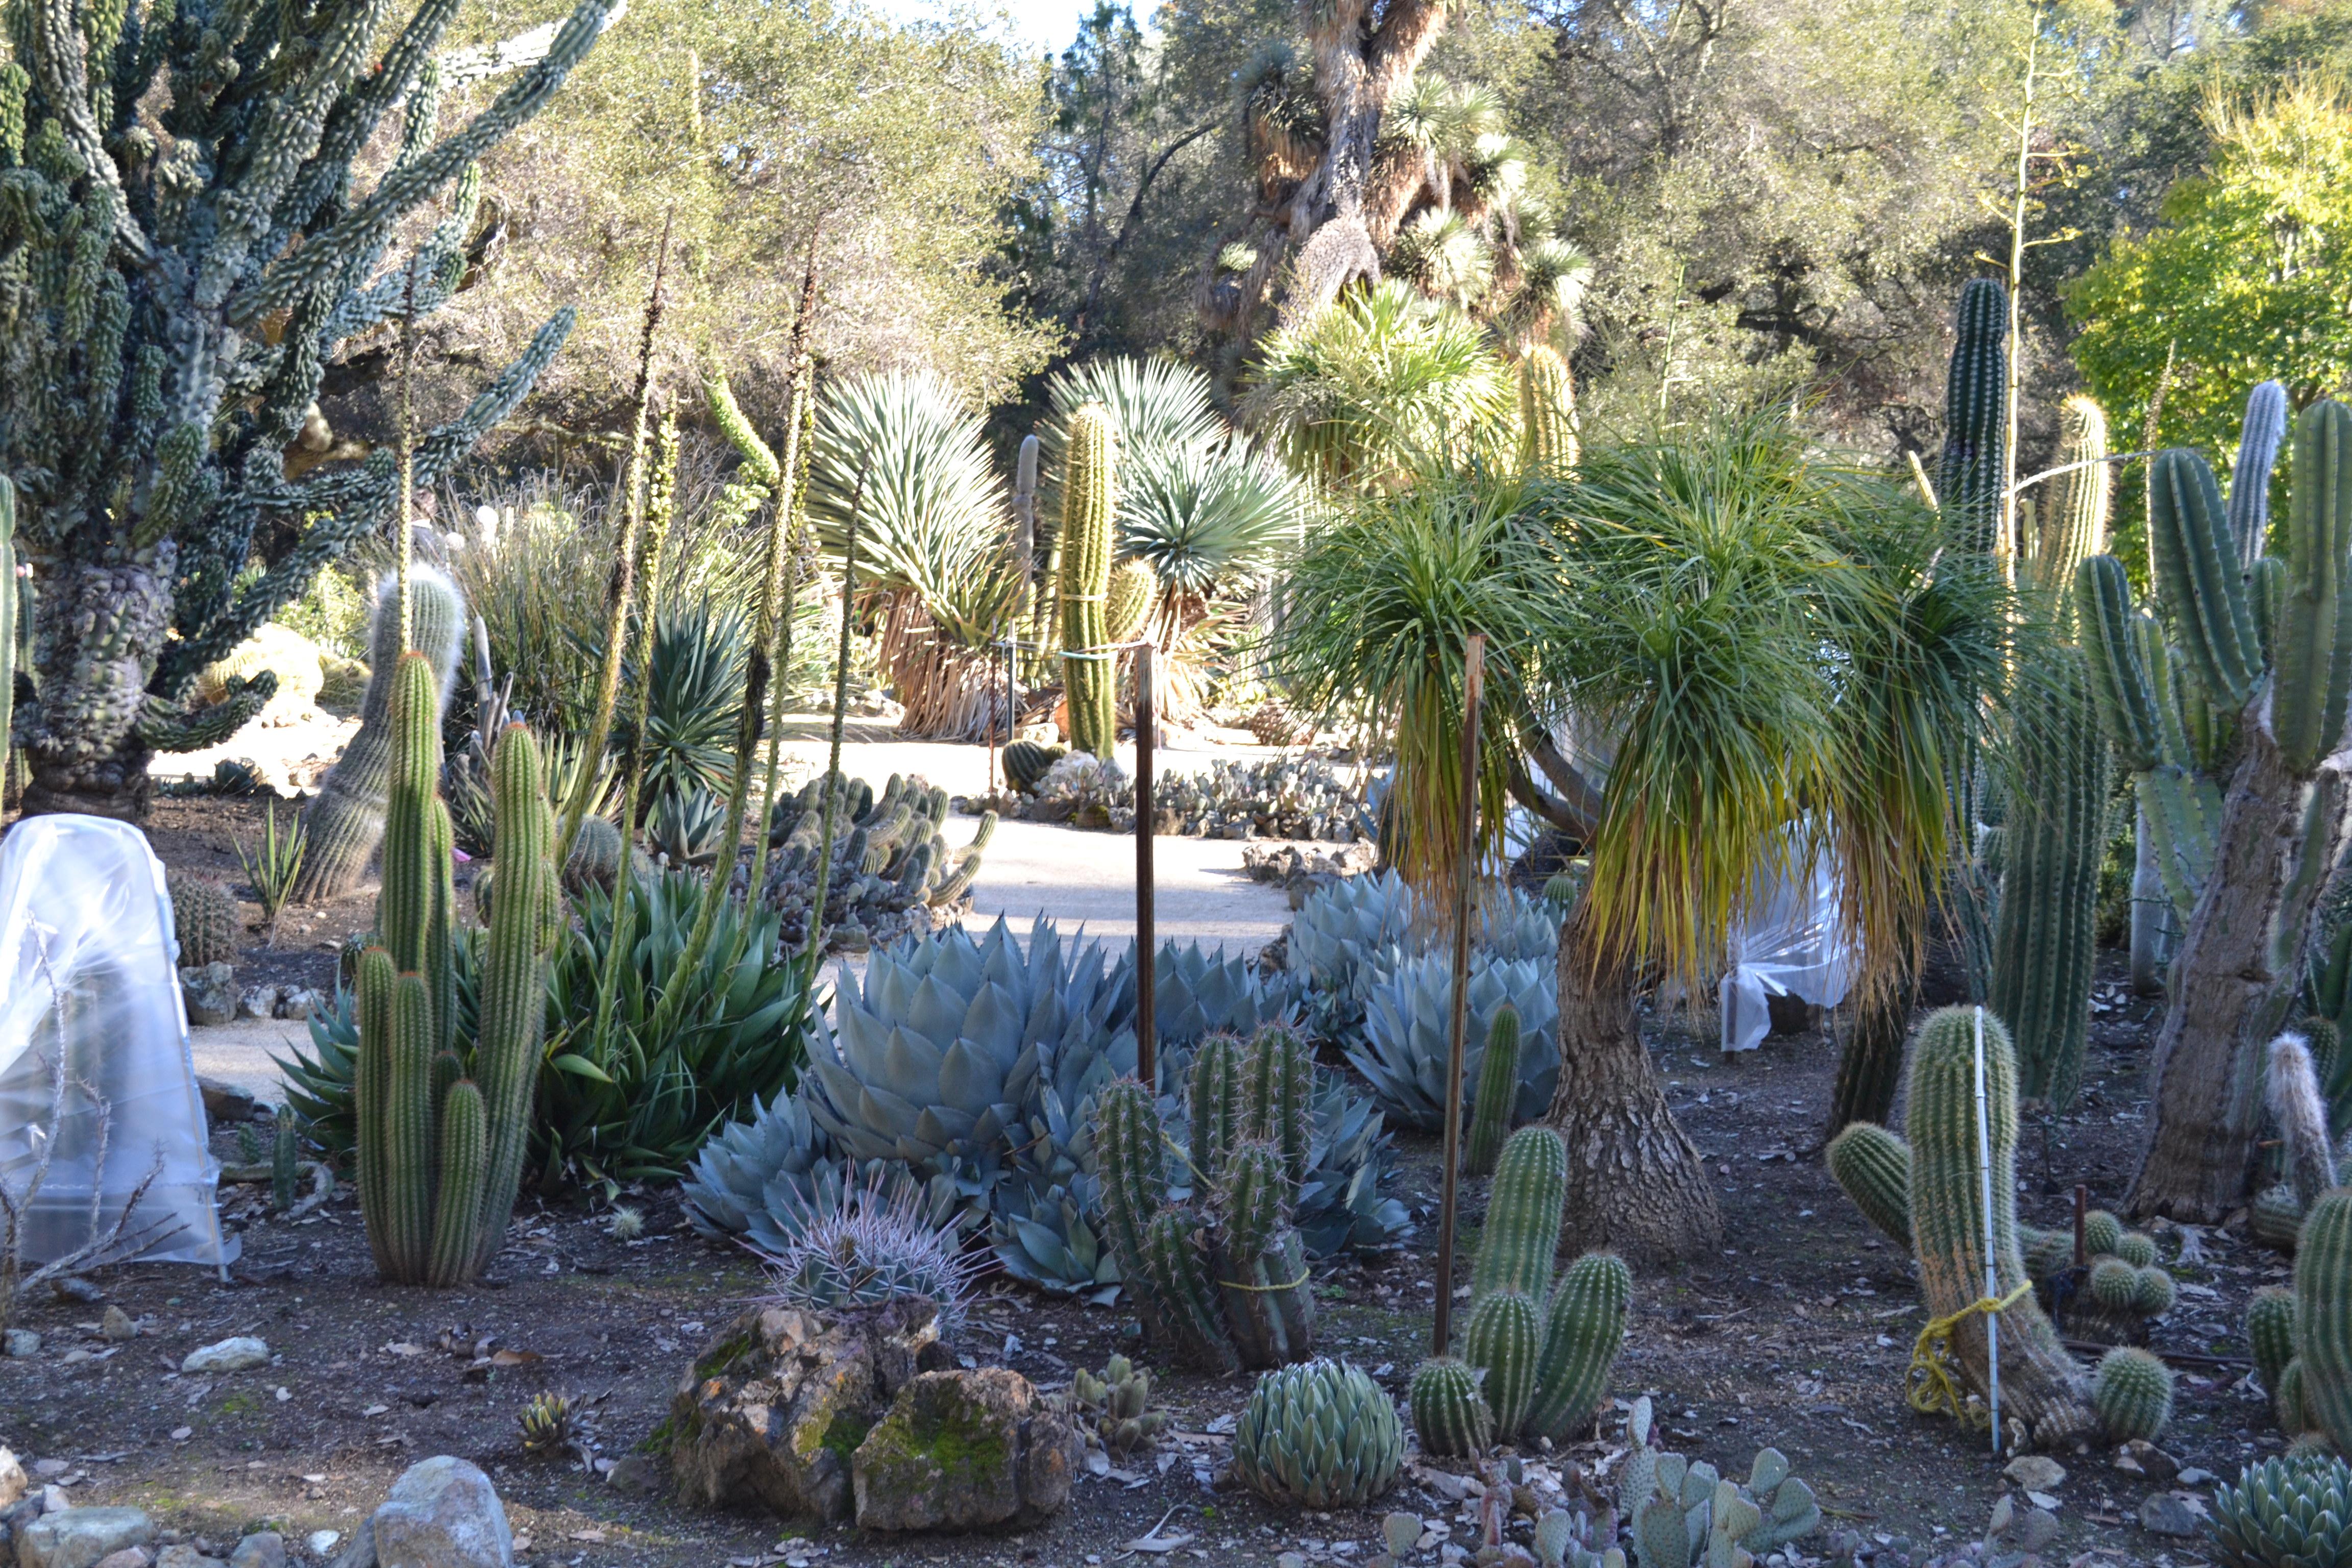 Merveilleux File:Arizona Cactus Garden At Stanford University 5.JPG